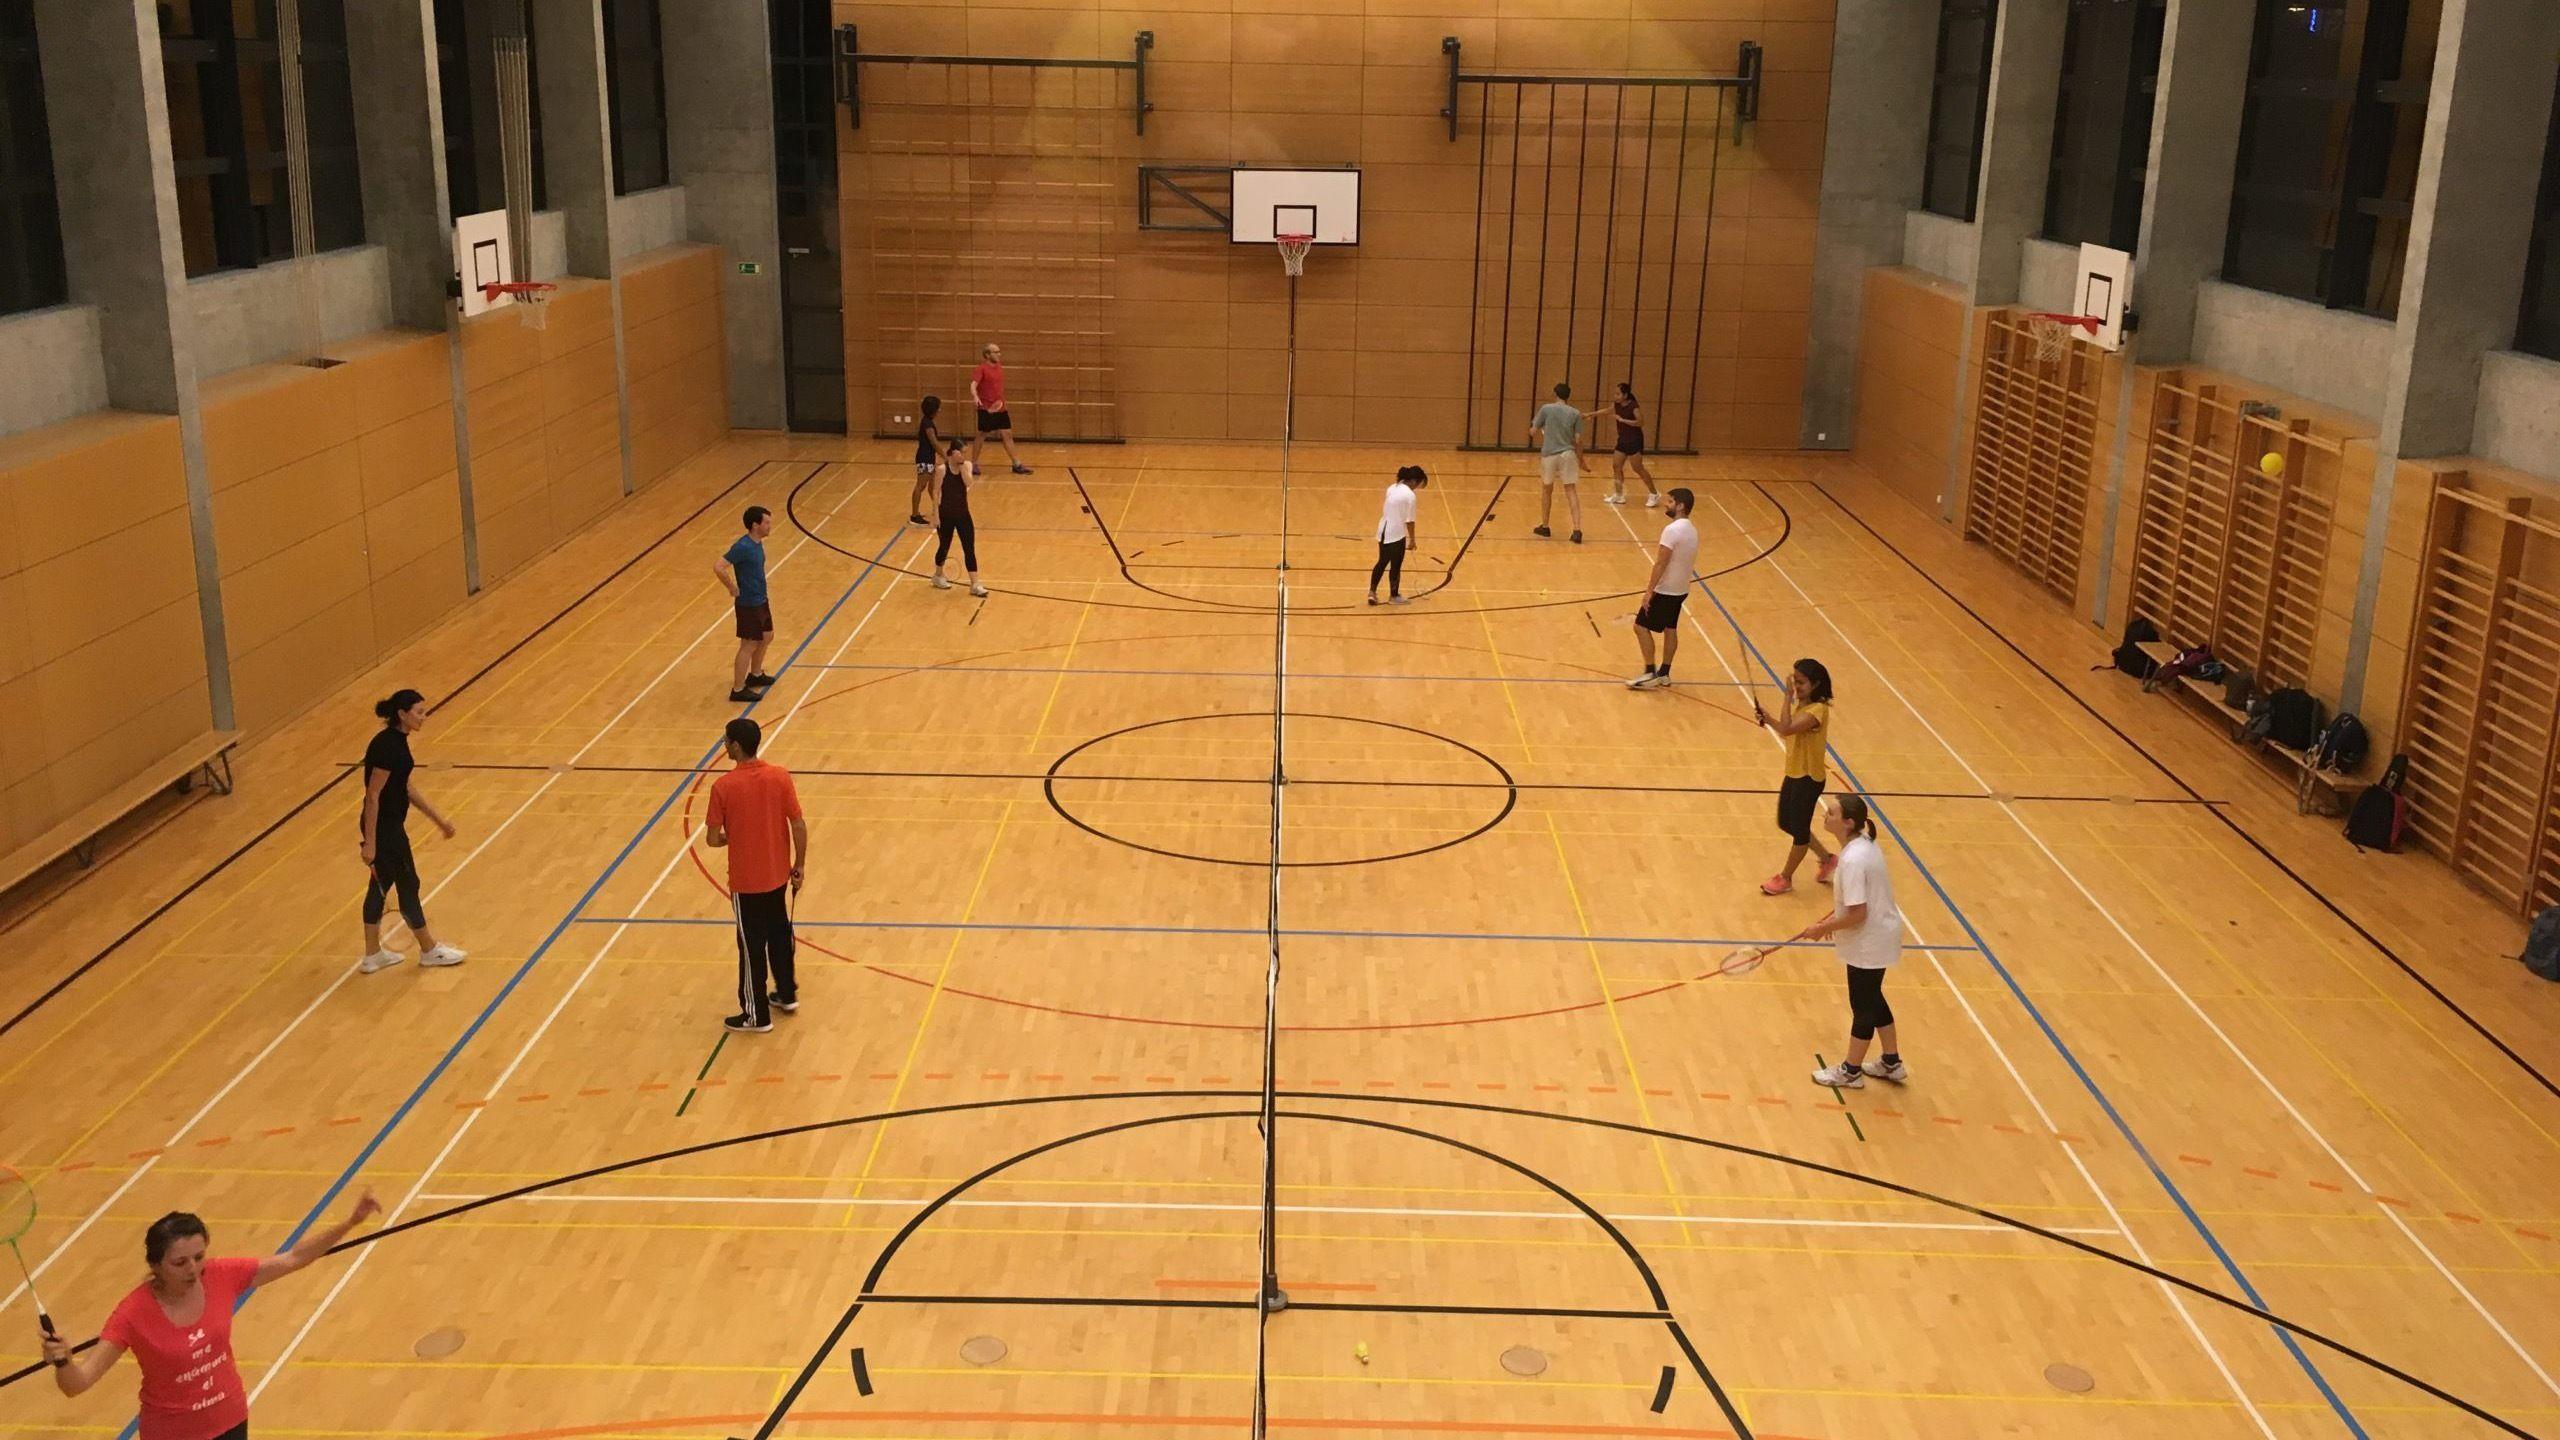 Thursday Badminton (Nations) - All levels